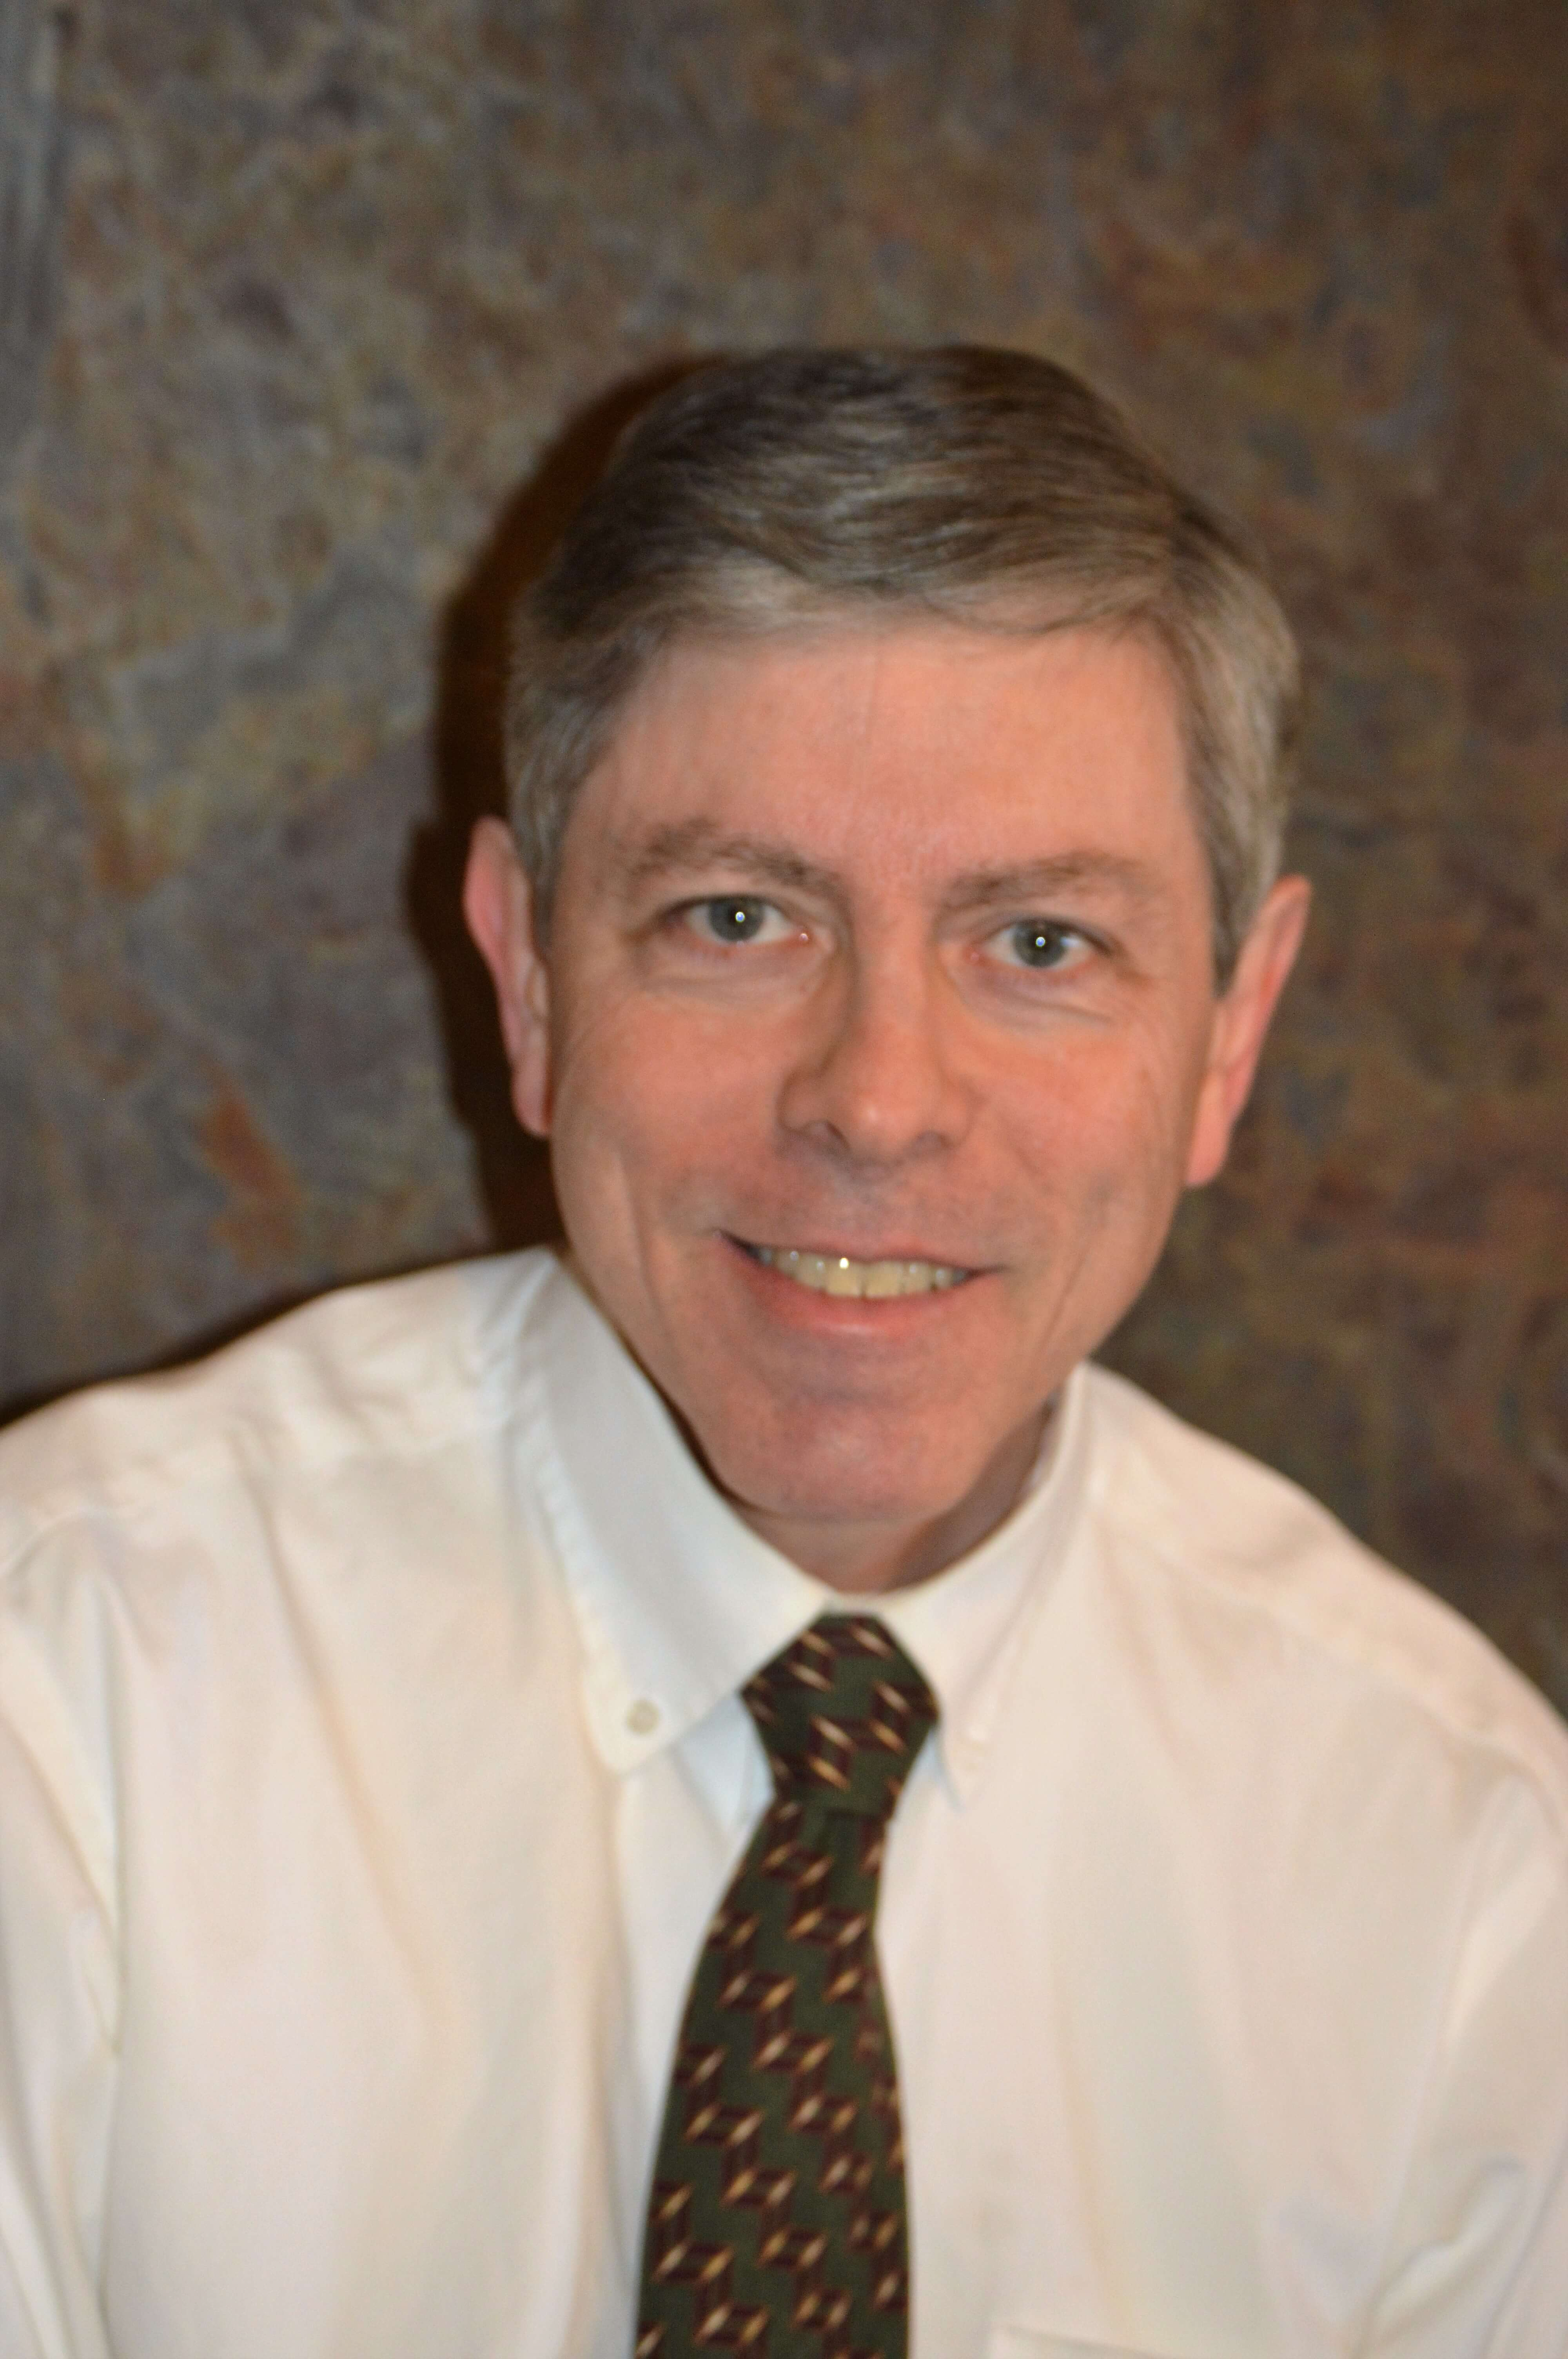 Kevin Choquette